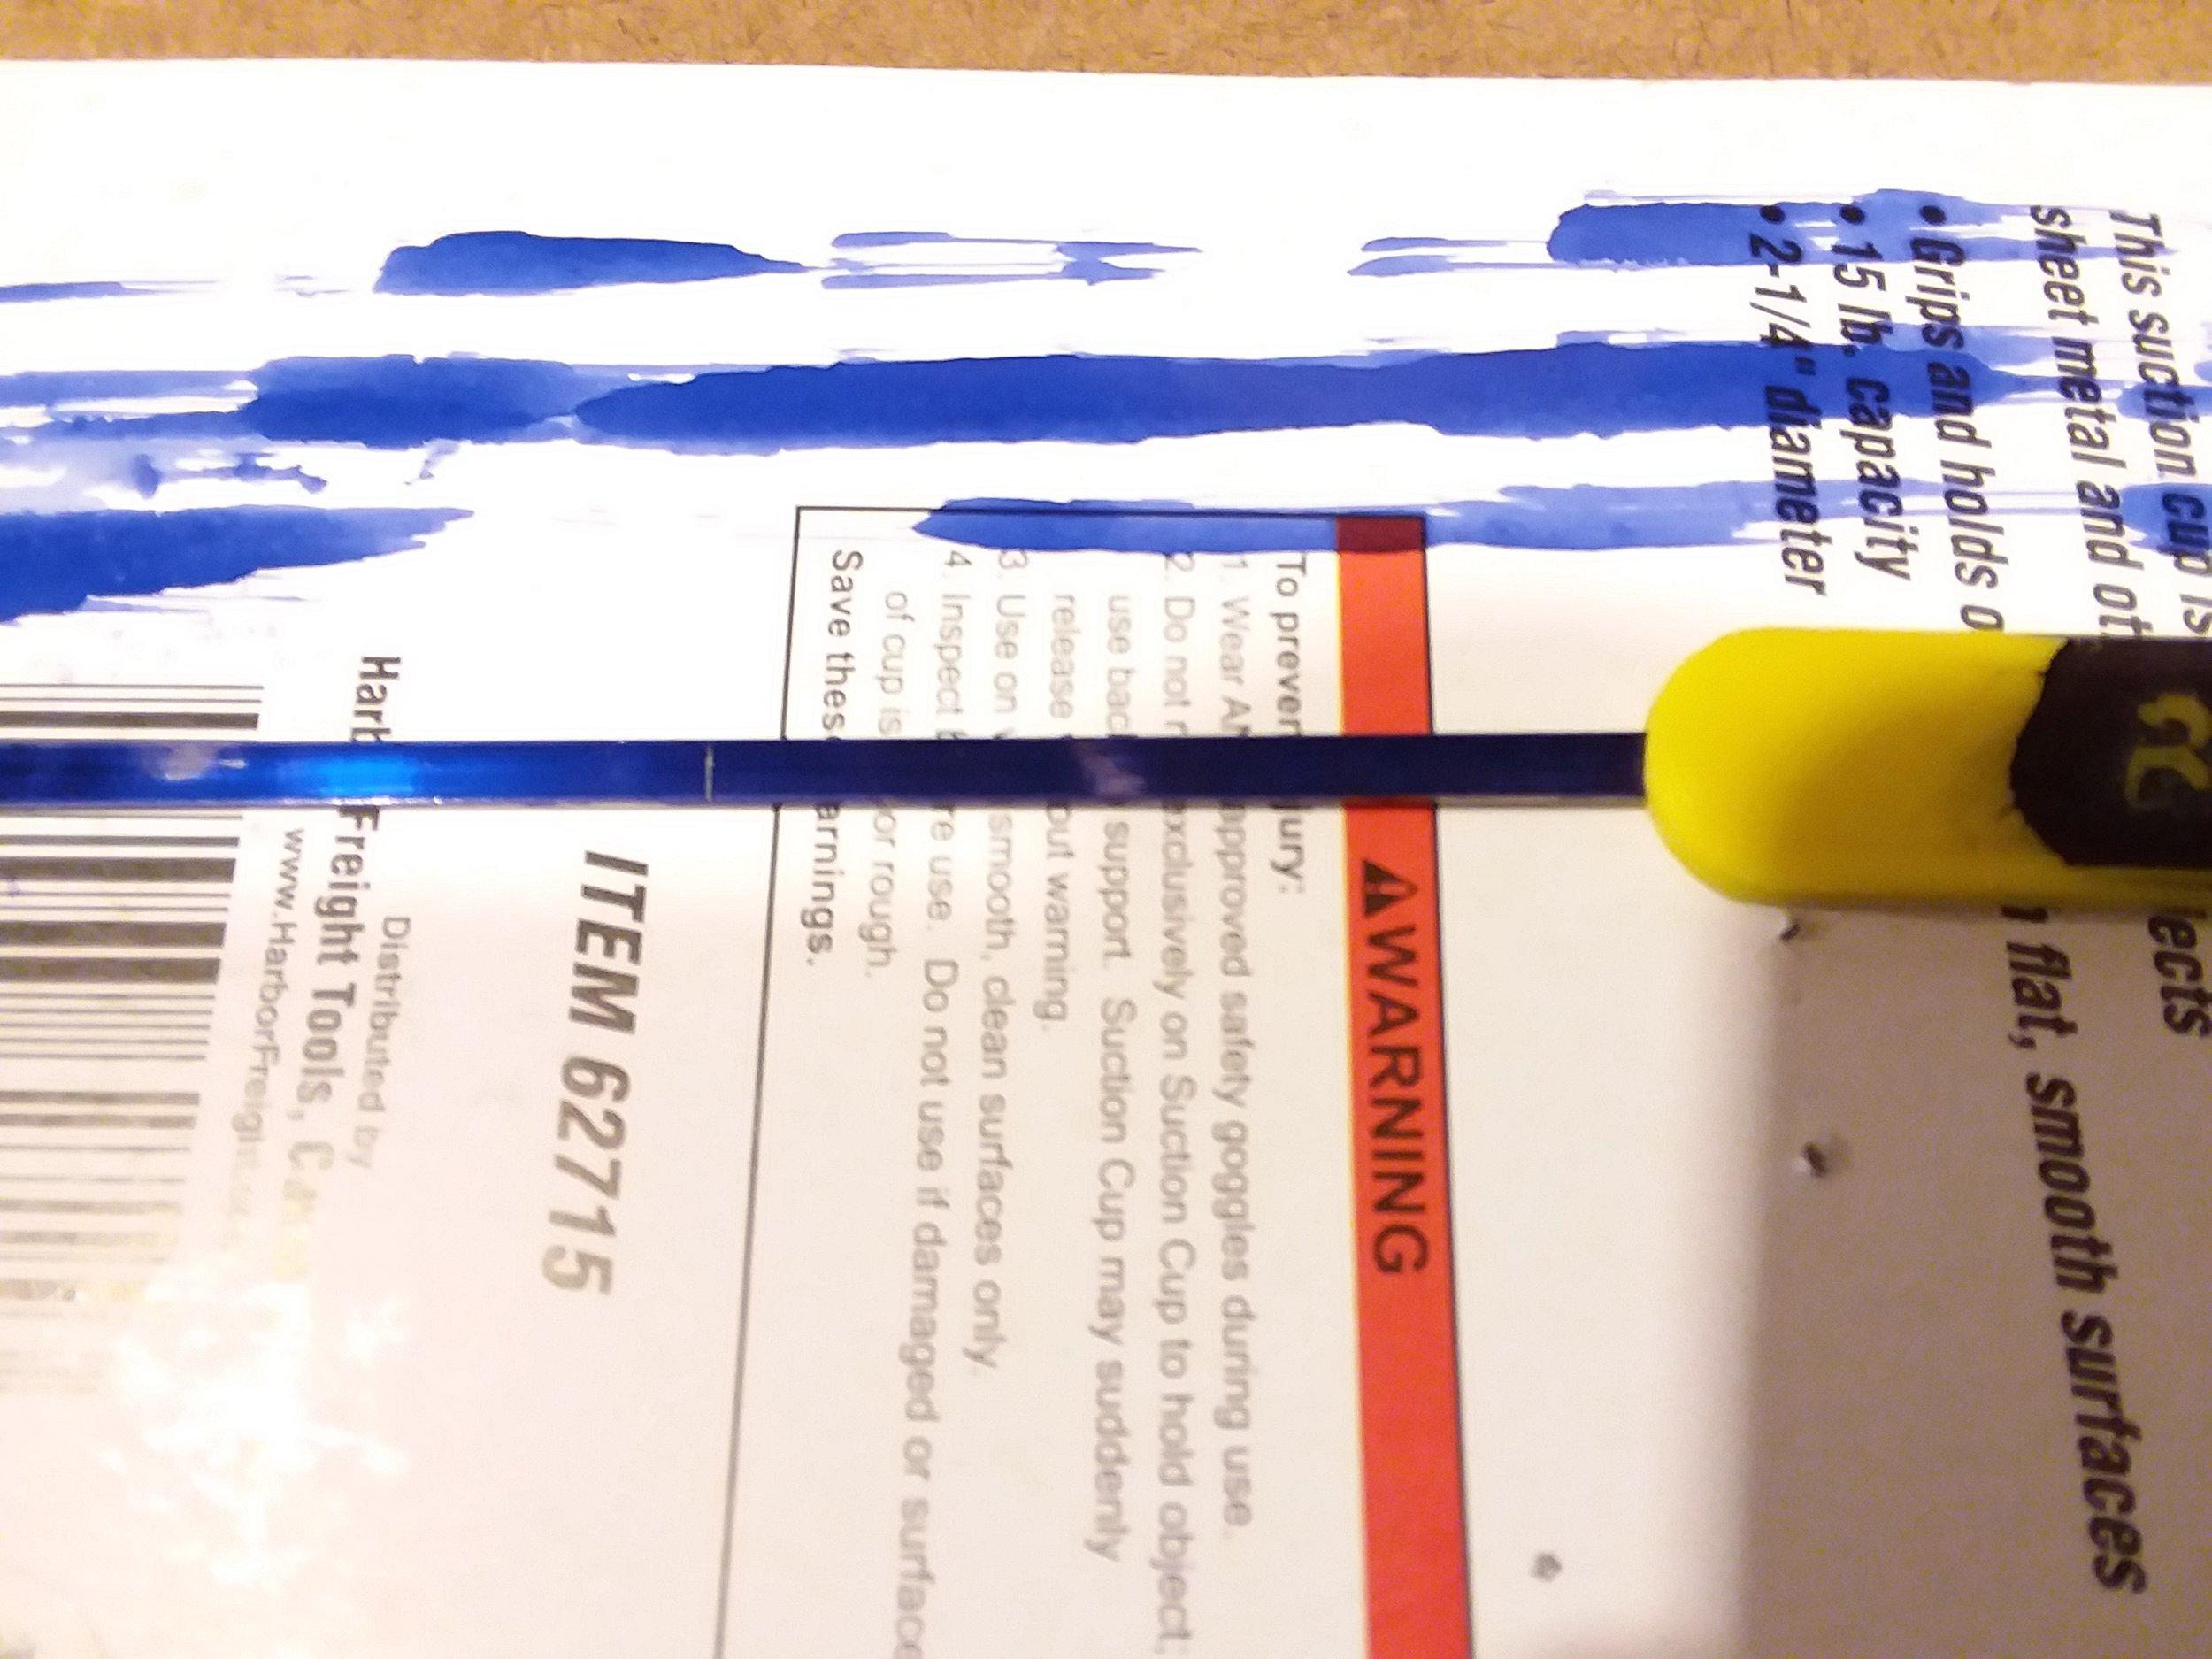 Marking length to cut